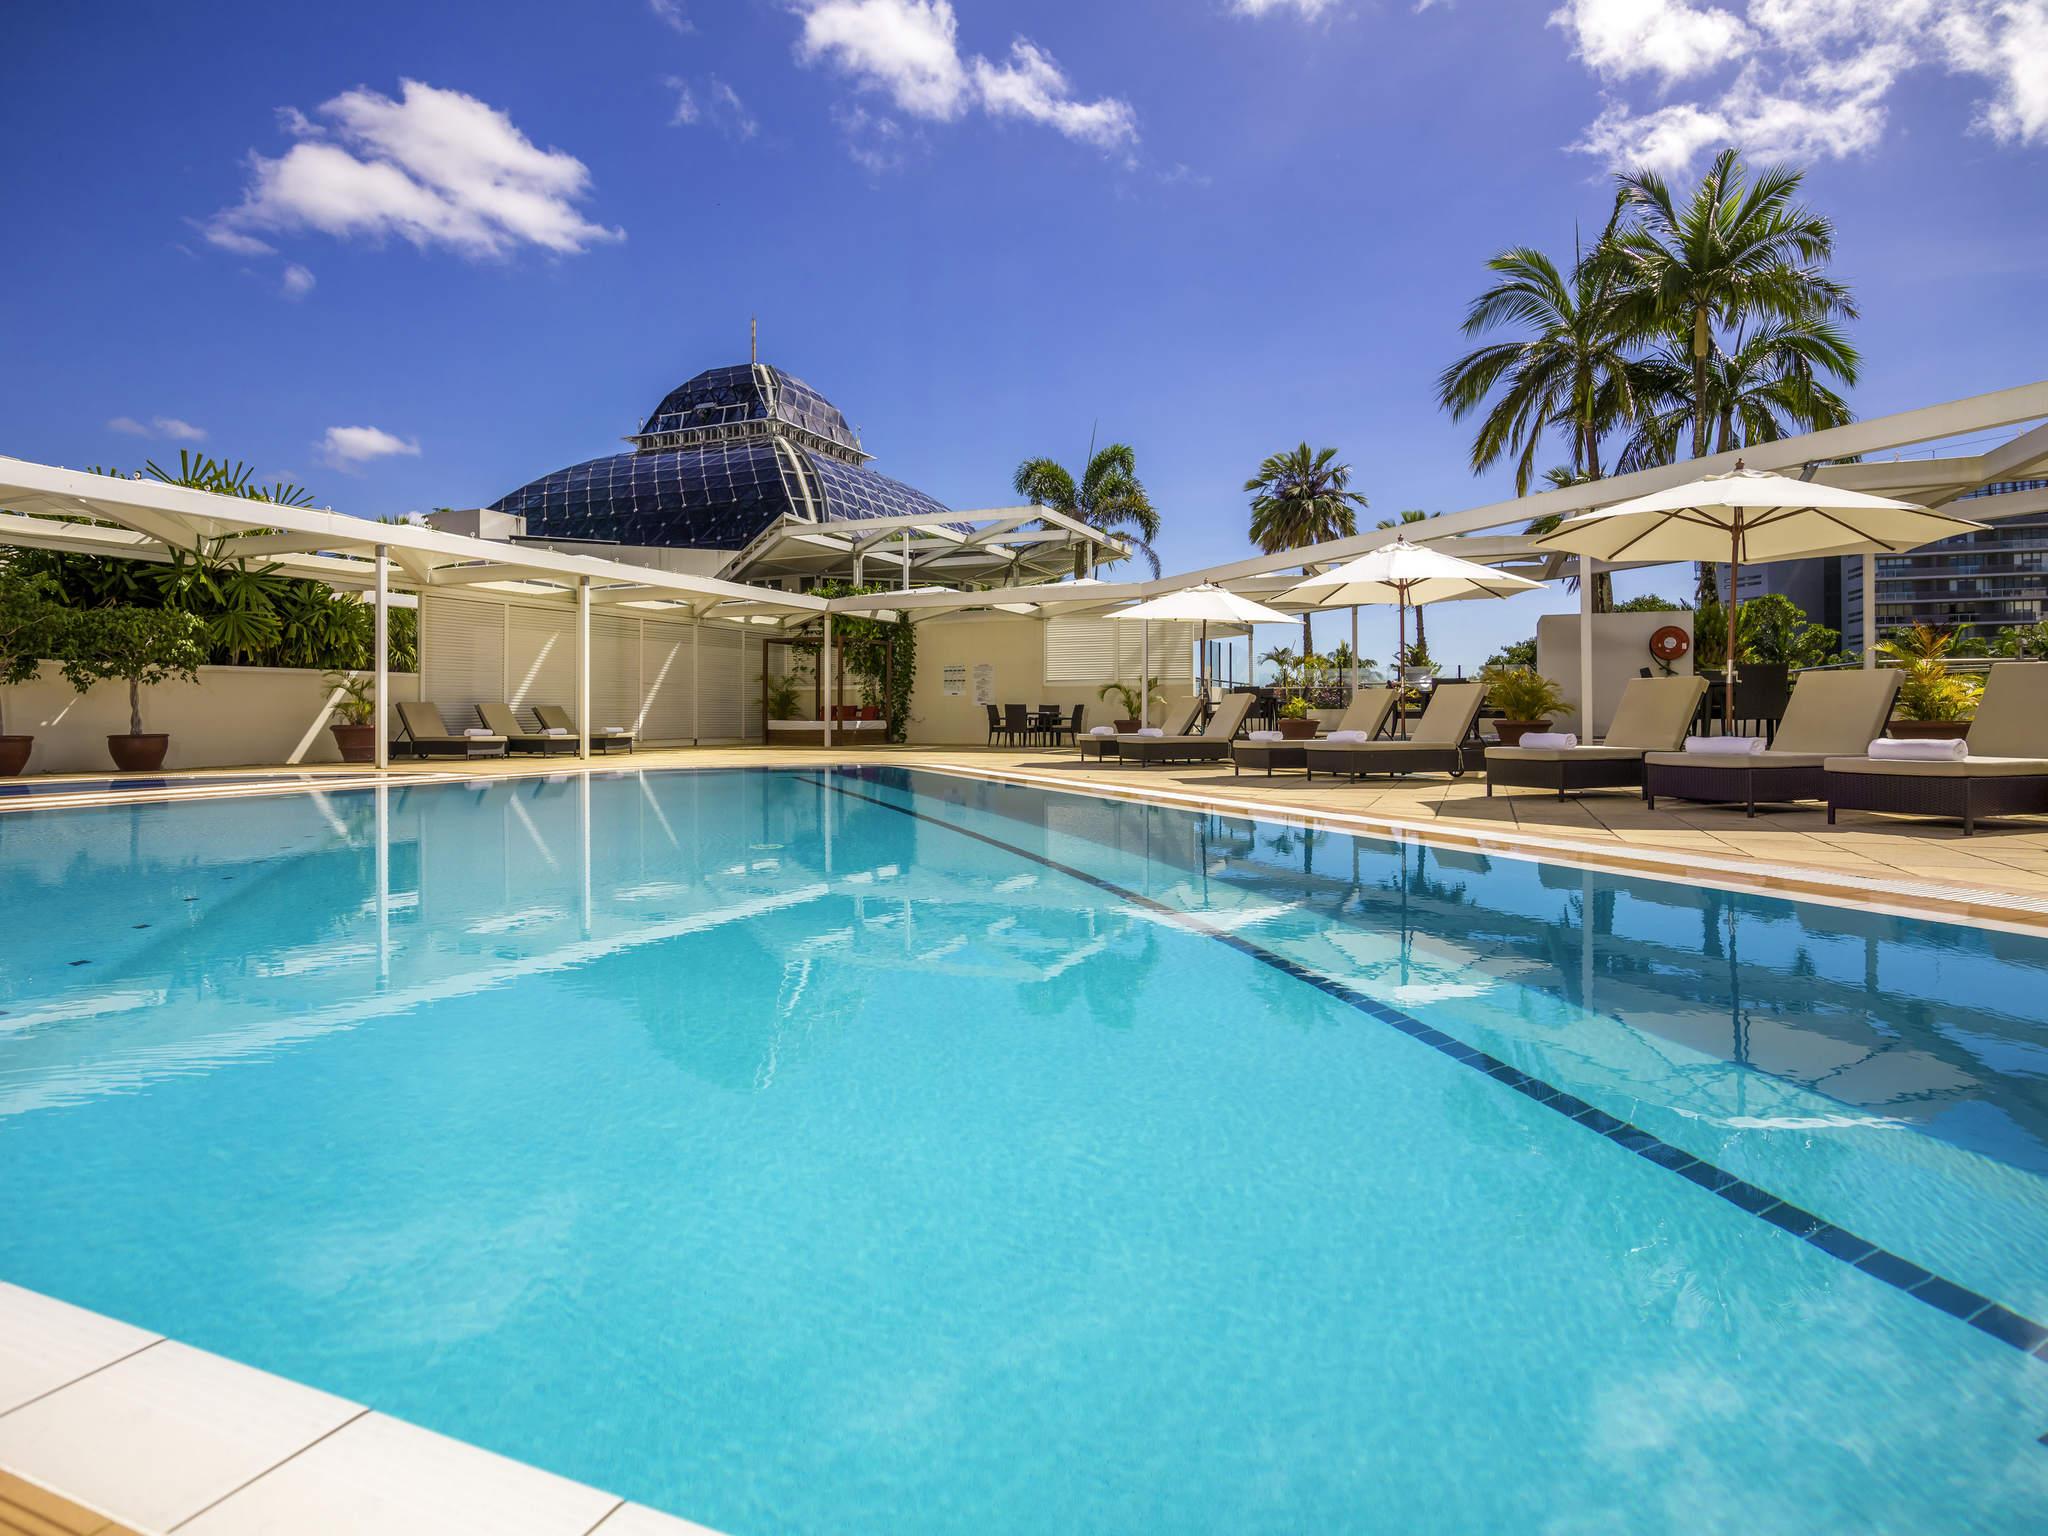 Pullman Reef Hotel Casino AccorHotels